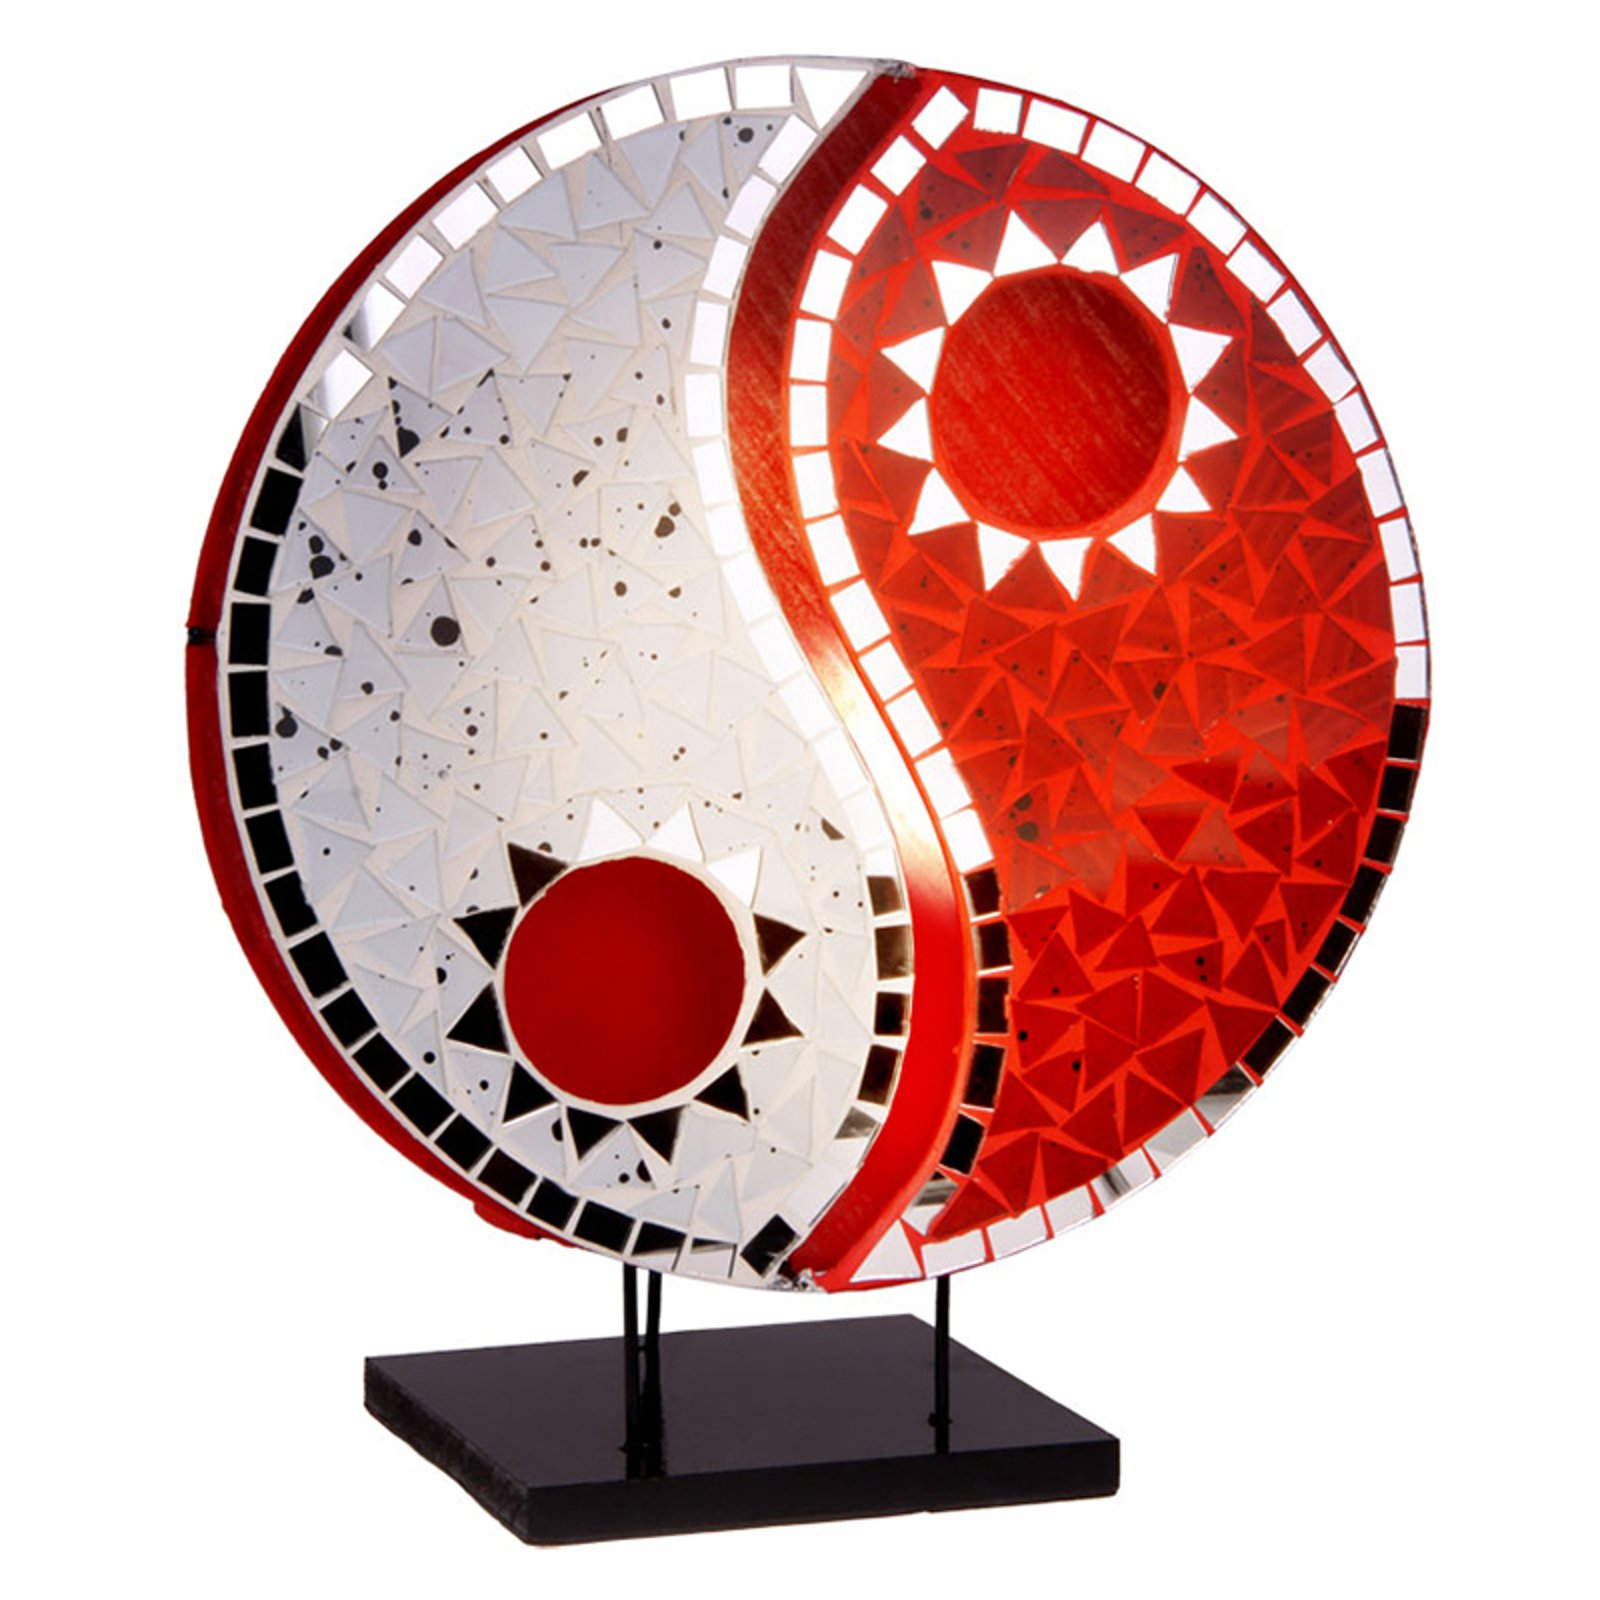 Bordlampe Ying Yang med mosaiske speilsteiner, rød